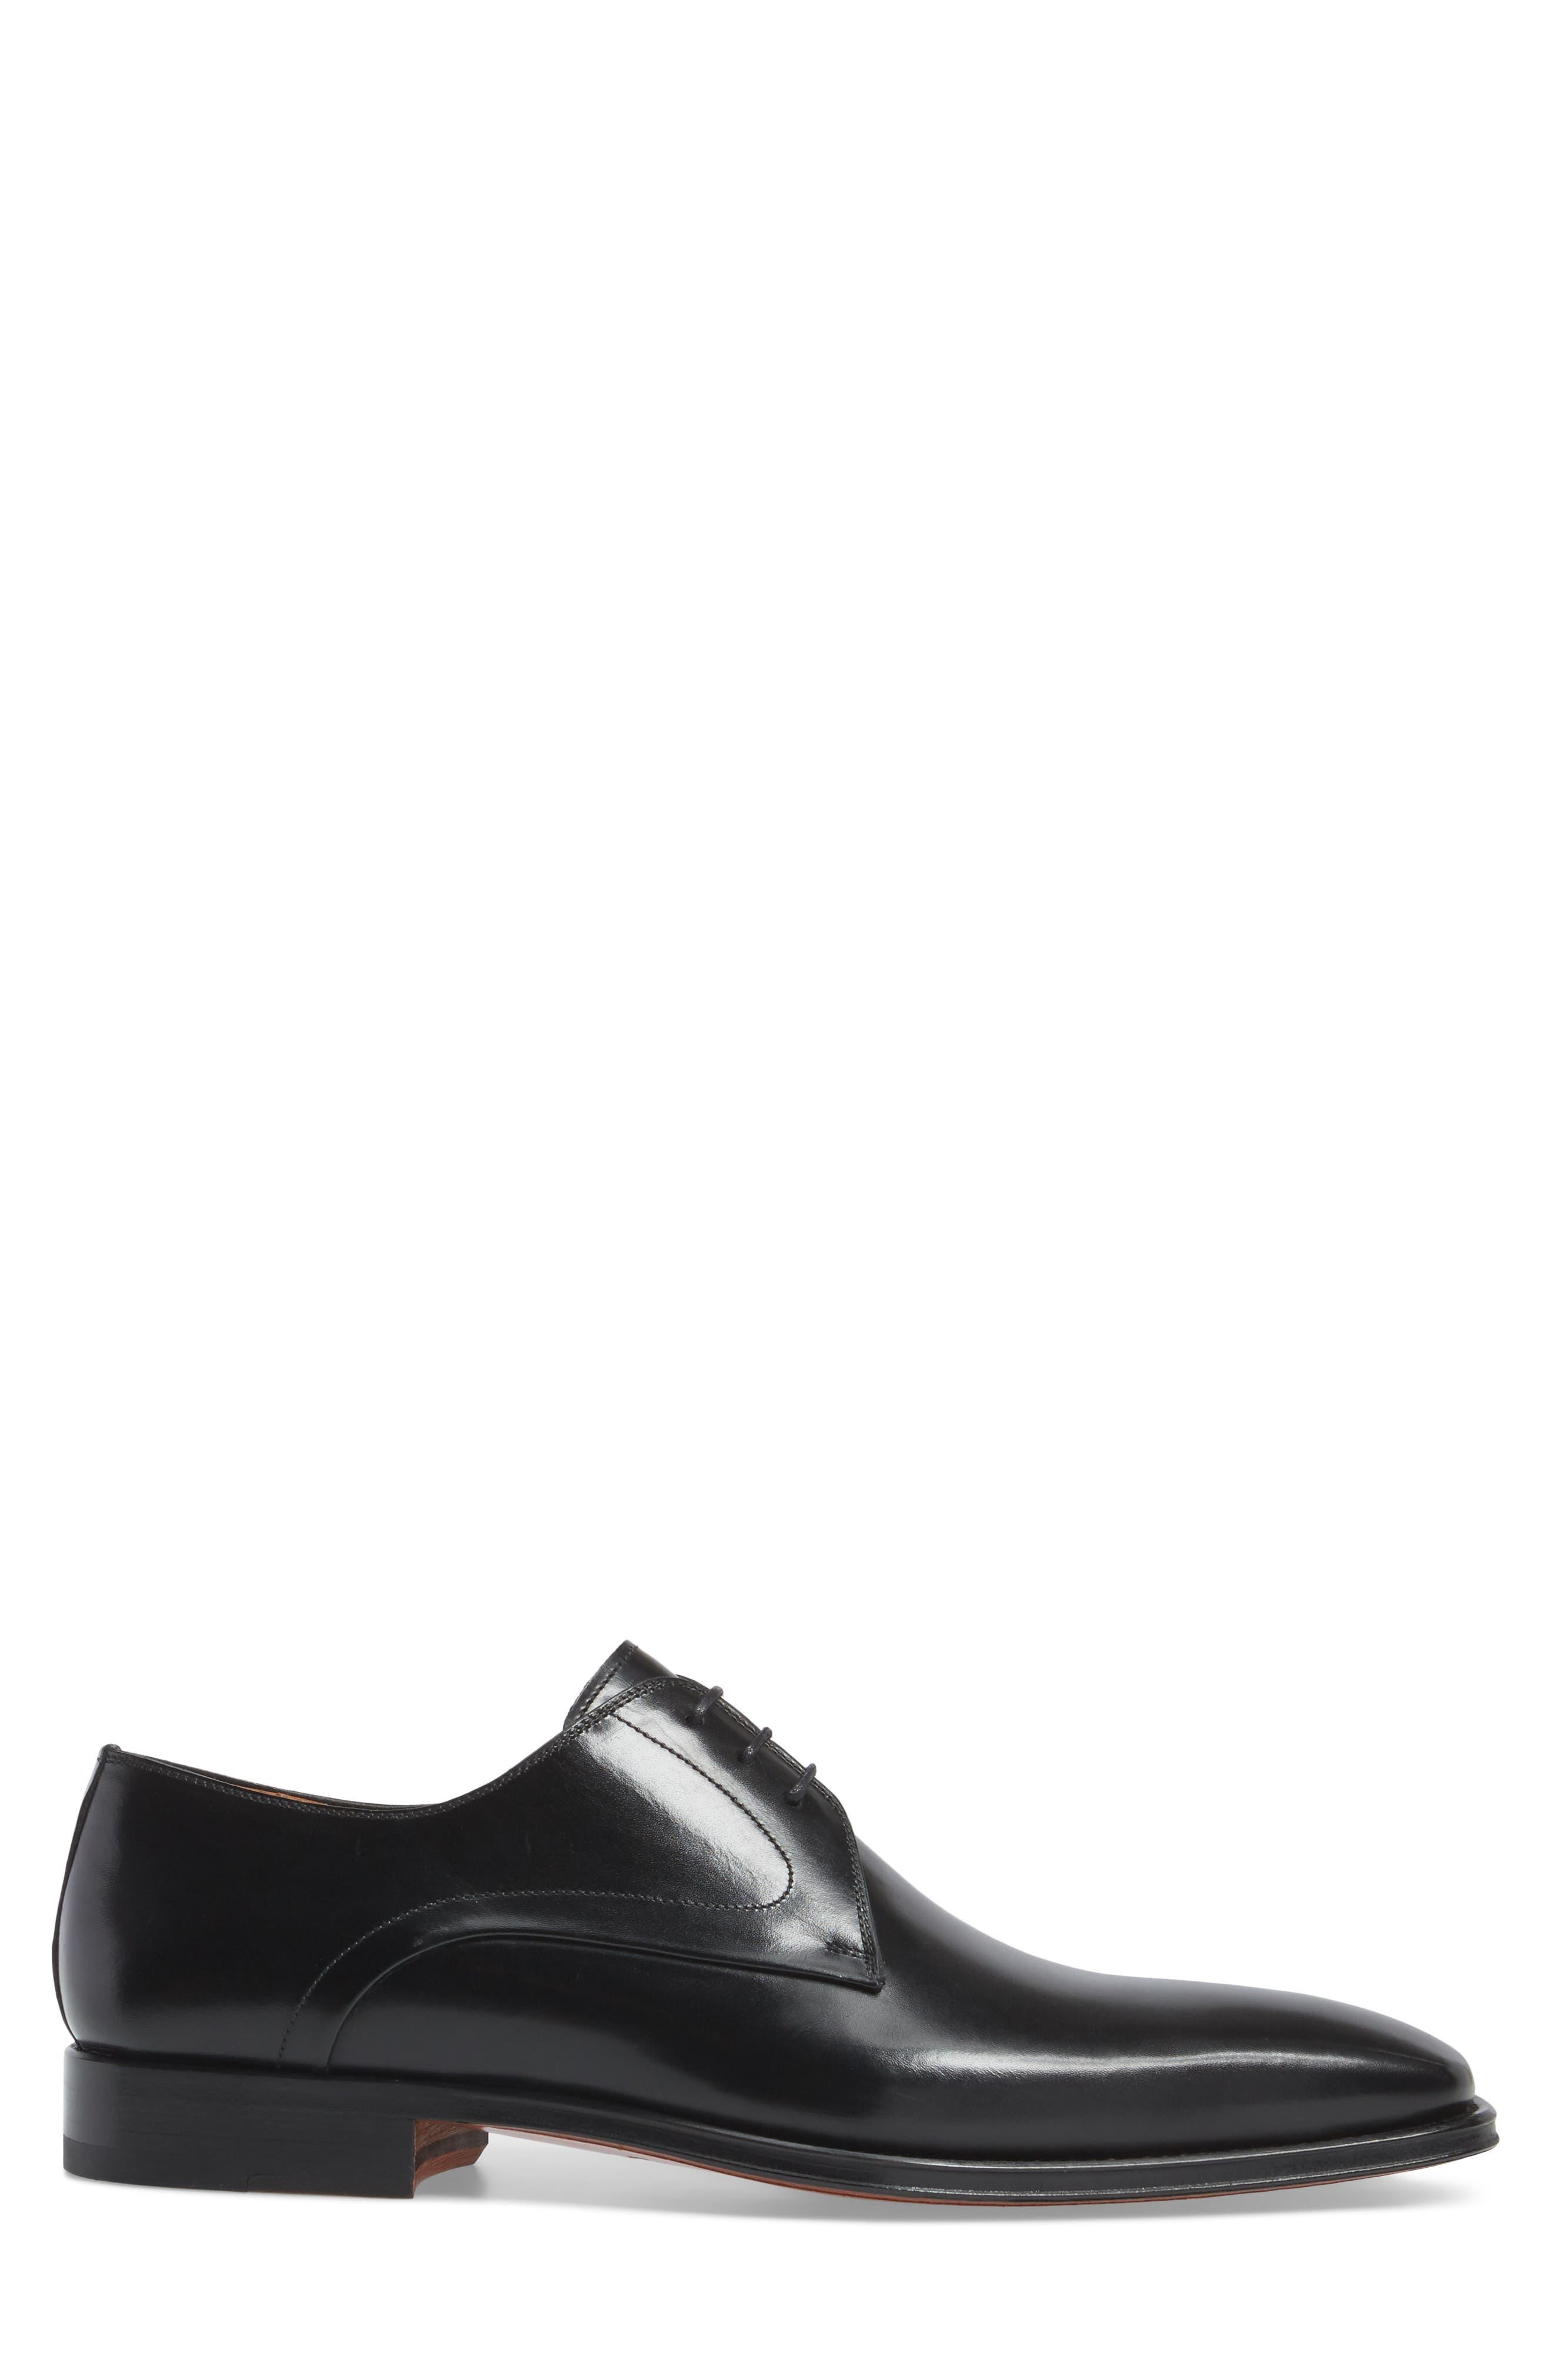 Mario Plain Toe Derby,                             Alternate thumbnail 3, color,                             Black Leather